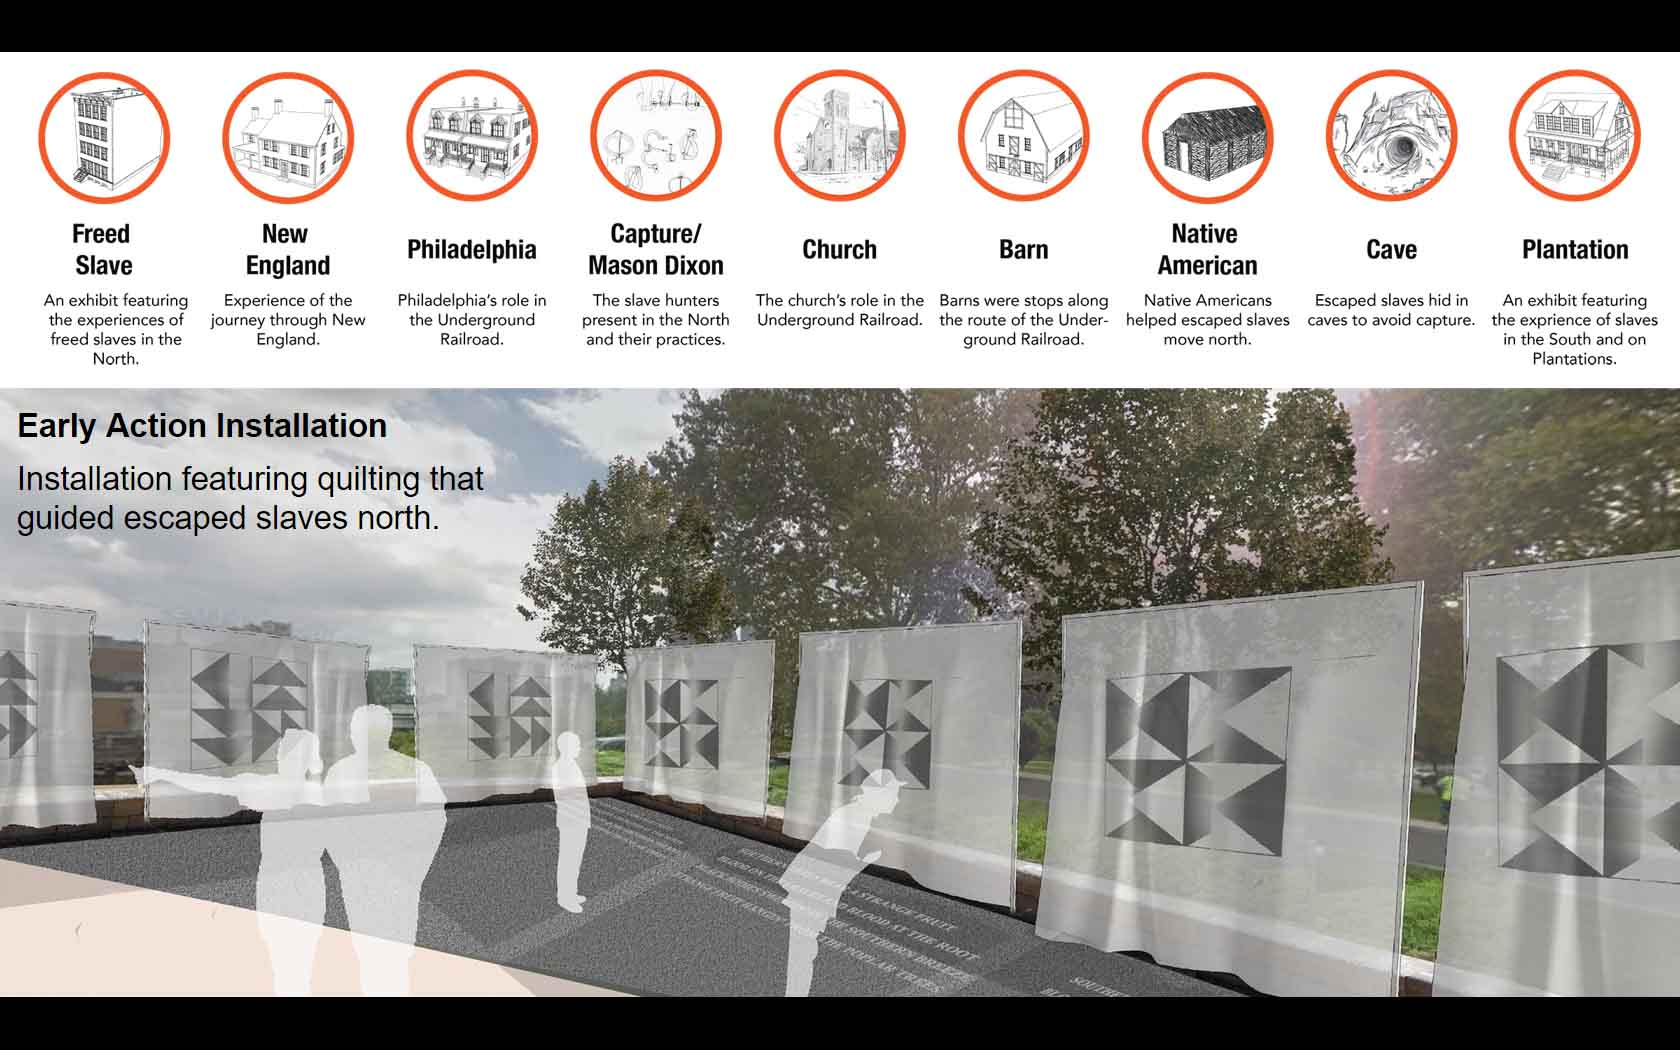 Design Team:  Abhinav BHARGAVA, Chris COUNIHAN, Ambica CHADHA, Shuo LI, Yuan-Fen LO, Diance TIAN